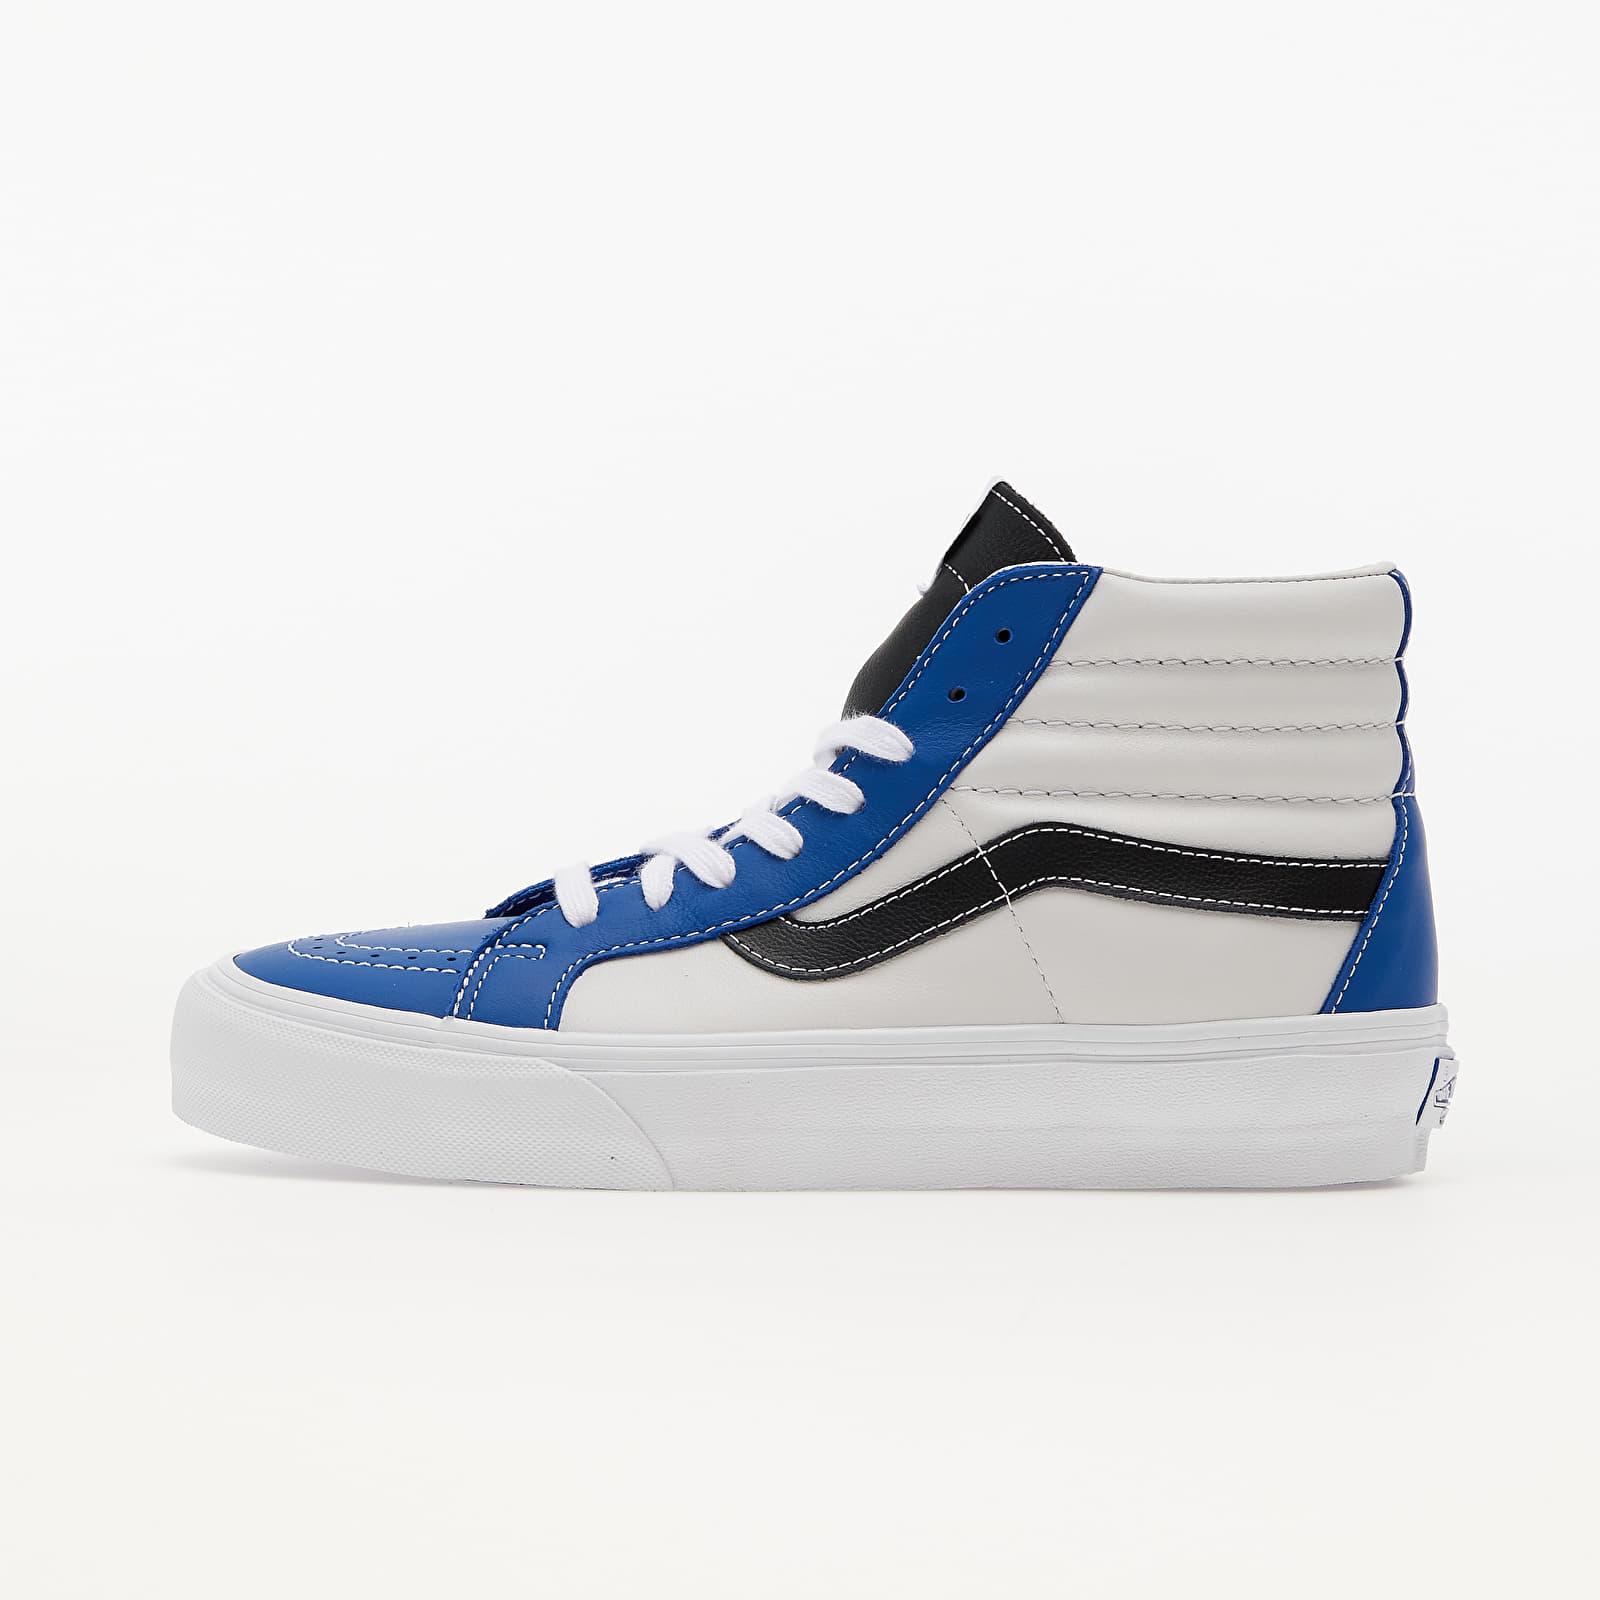 Vans Vault Sk8-Hi Reissue (Leather) Nautical Blue/ White/ Black EUR 43